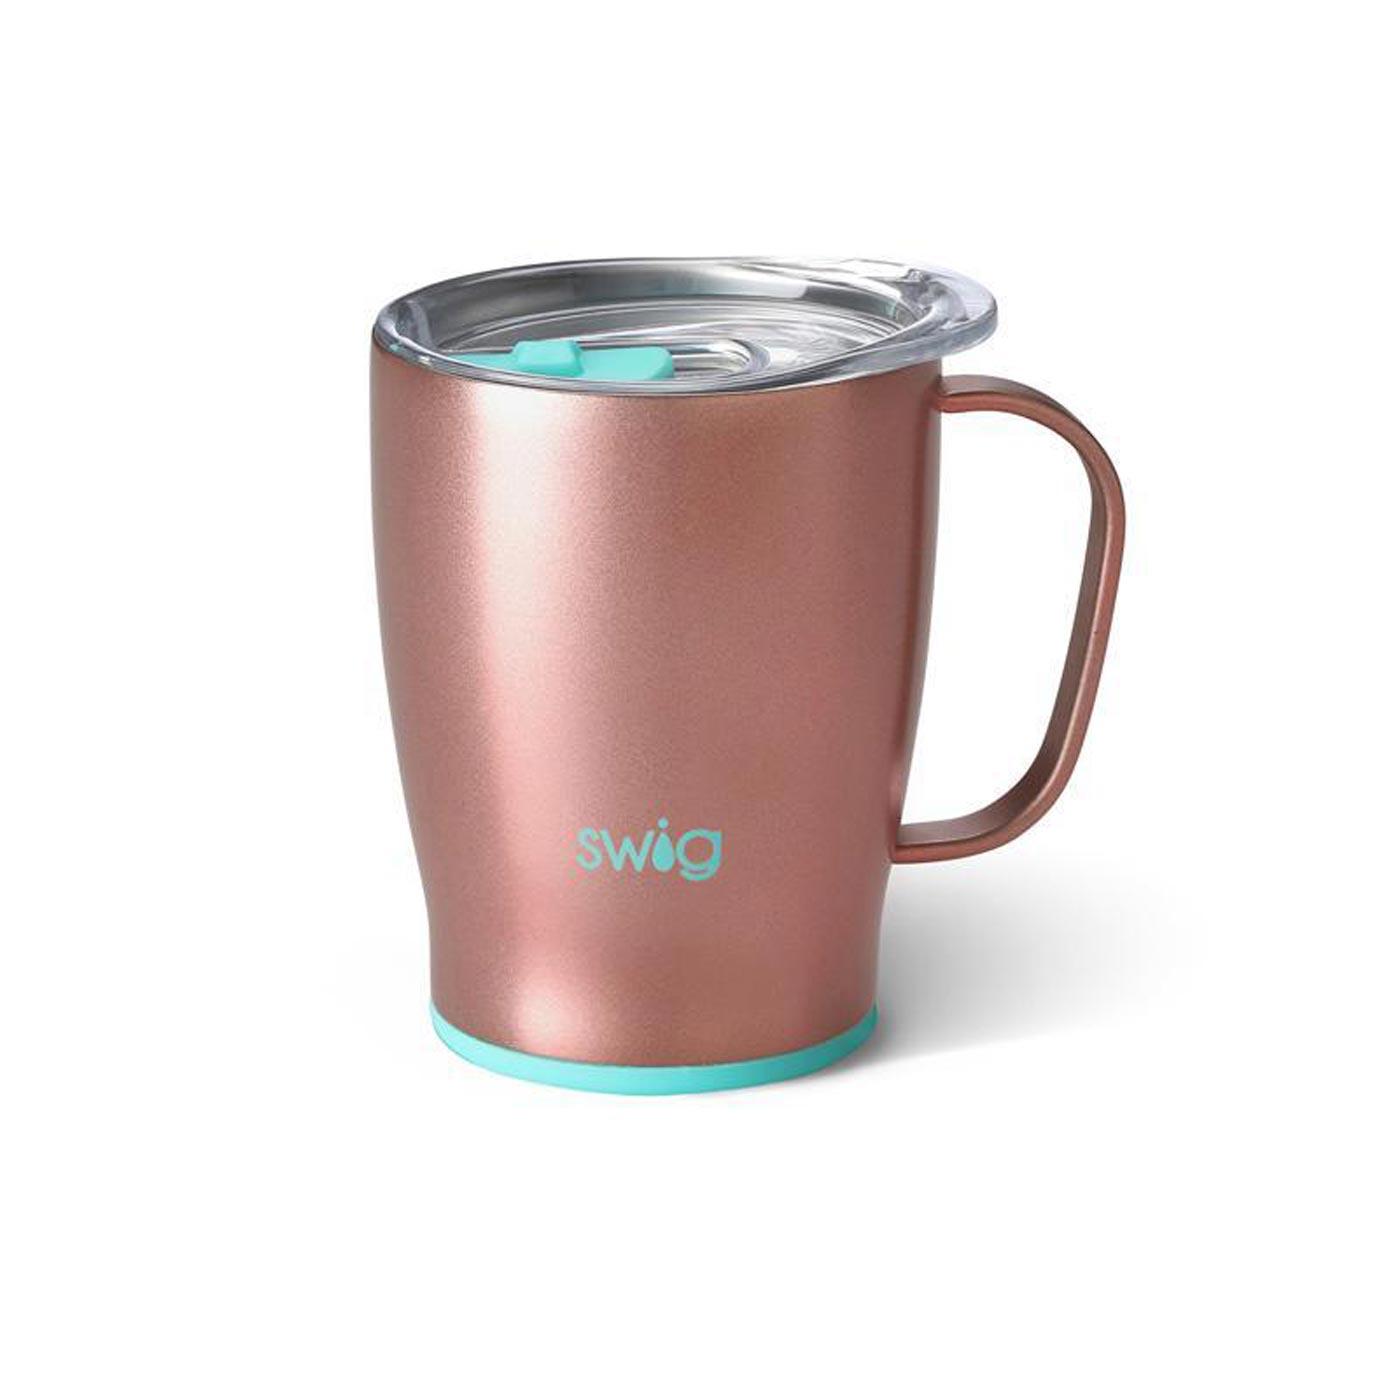 Swig life signature 18oz mug rose gold